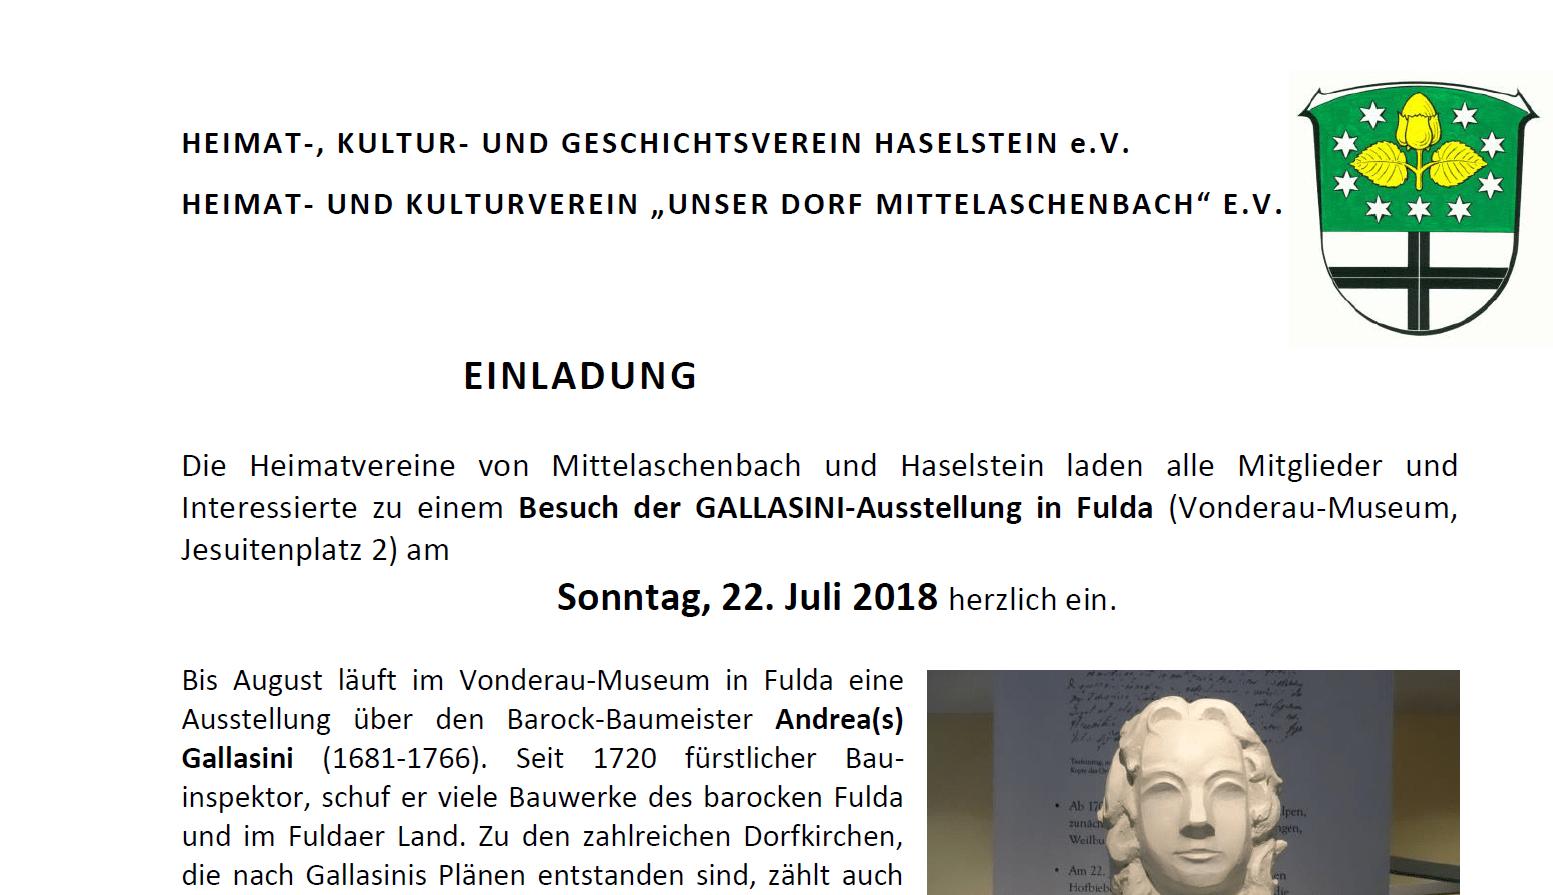 Gallasini-Ausstellung